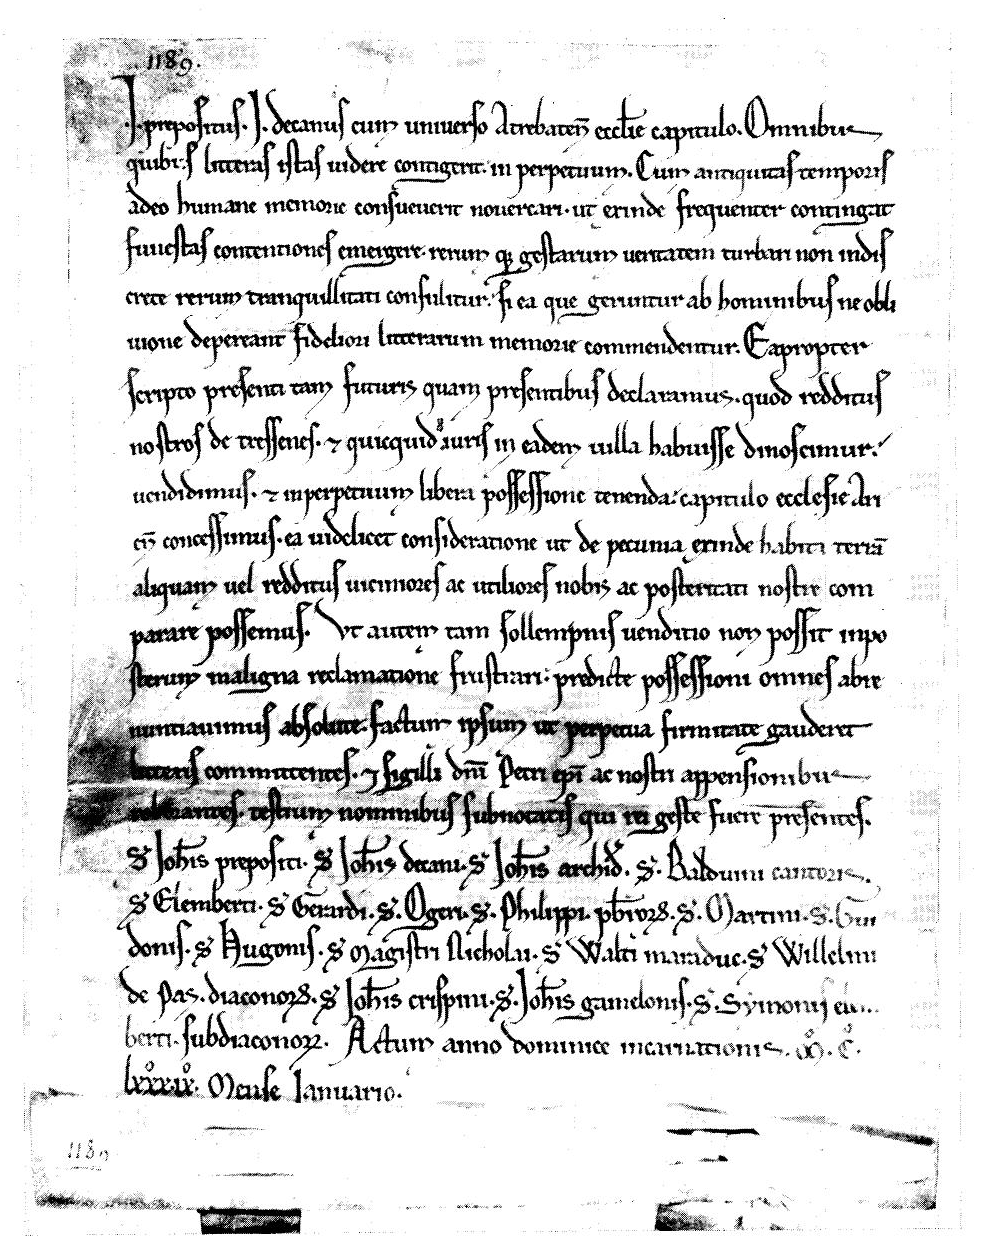 Les chartes des évêques d'Arras. 1093-1203 - Benoît-Michel Tock